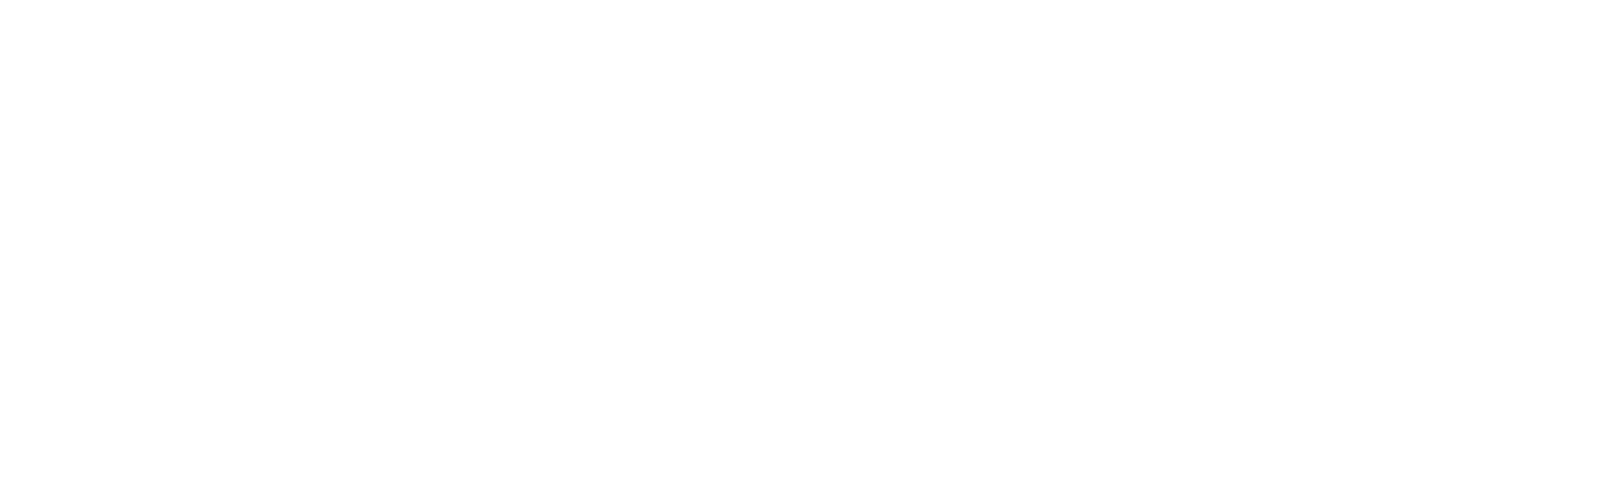 Grand Central Publishing logo